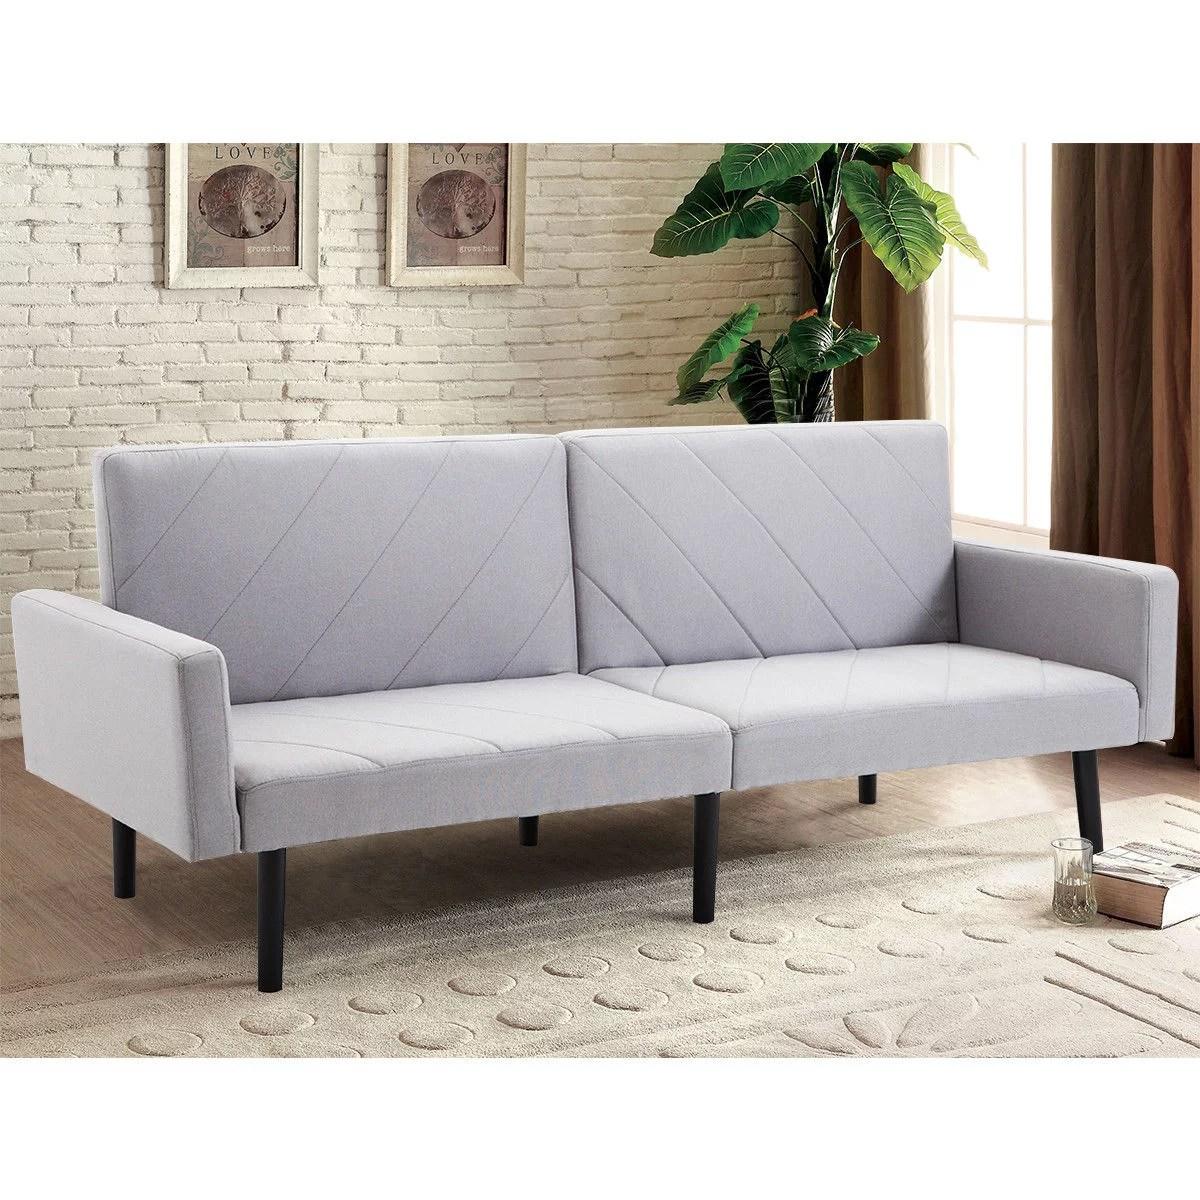 costway futon sofa bed convertible recliner couch splitback sleeper w wood legs gray